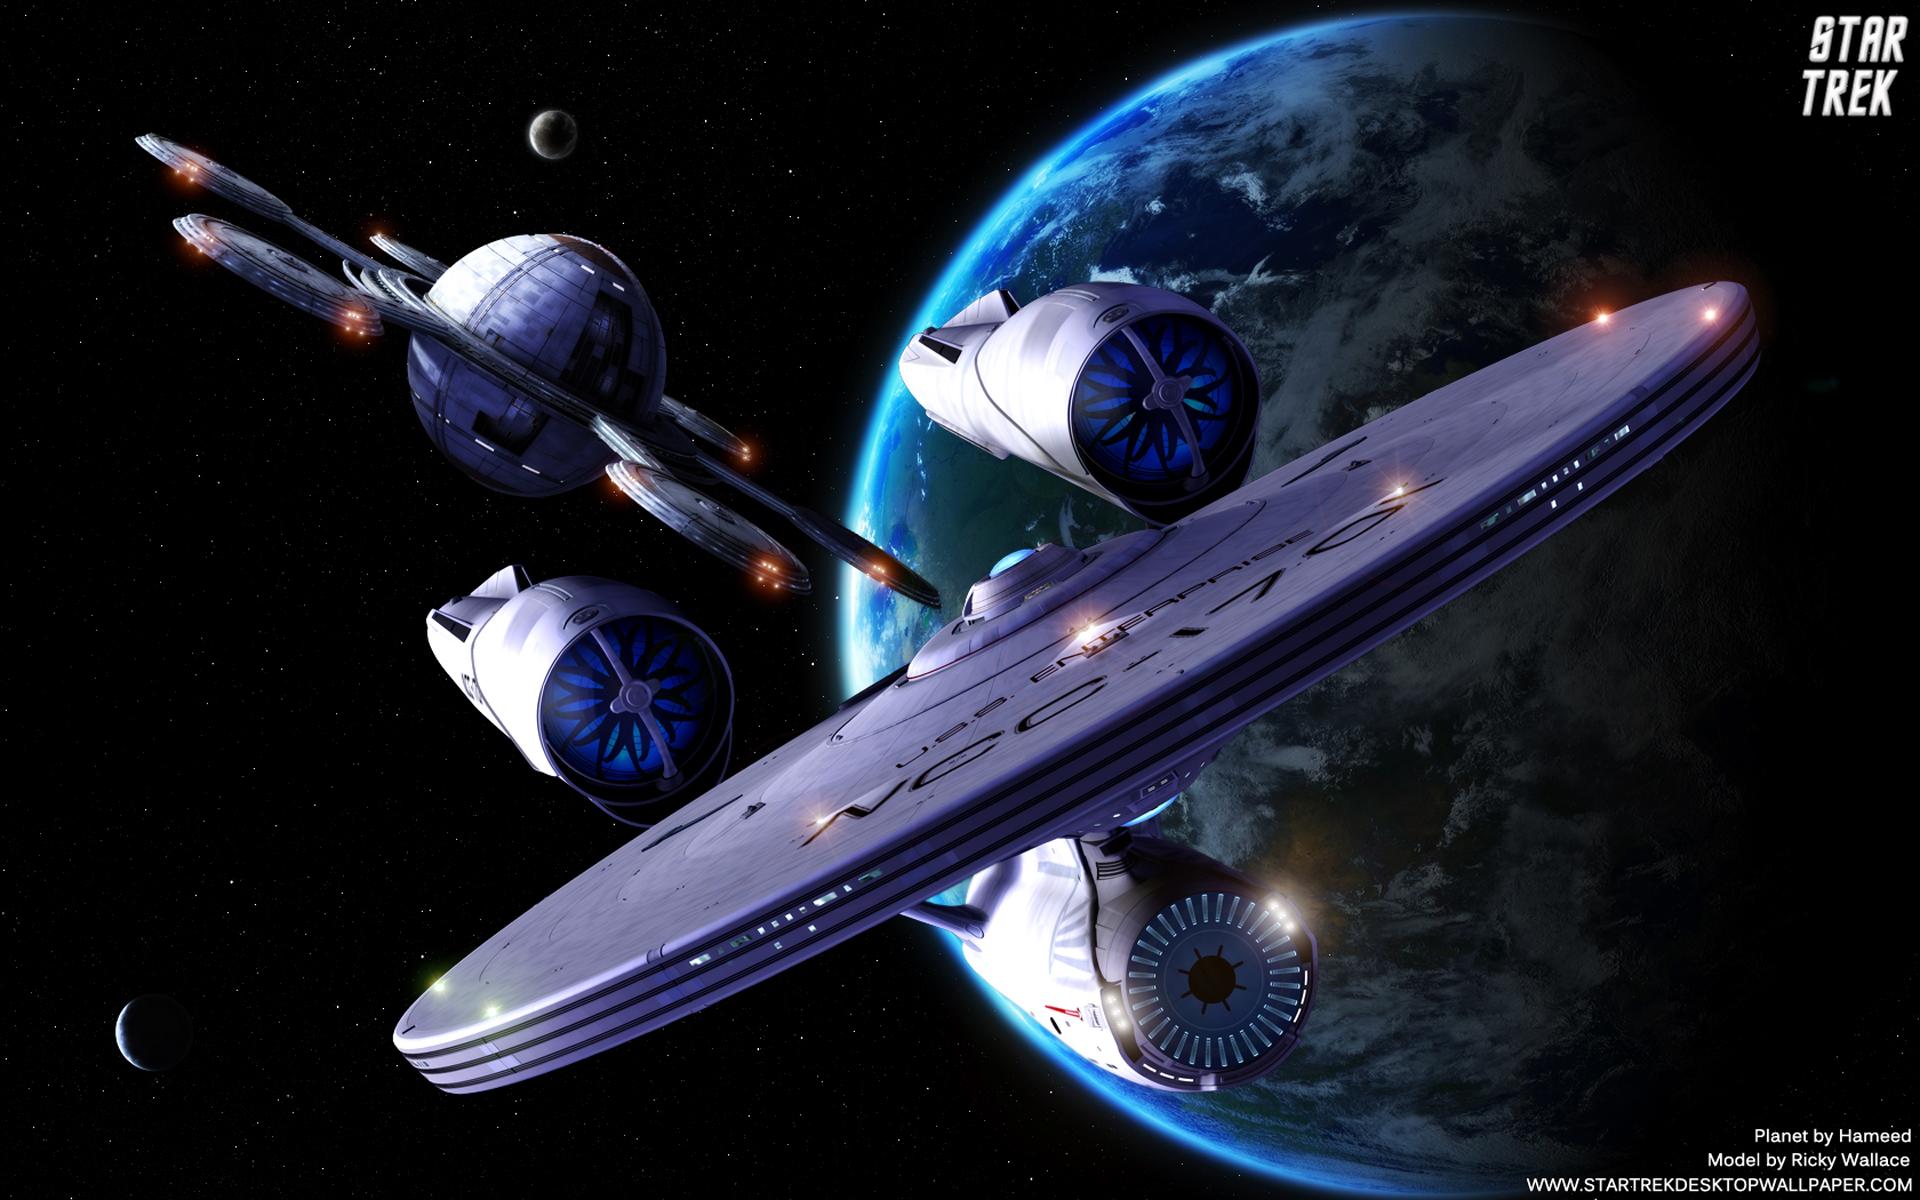 star starbase trek federation wallpaper screen saver planets 1920x1200